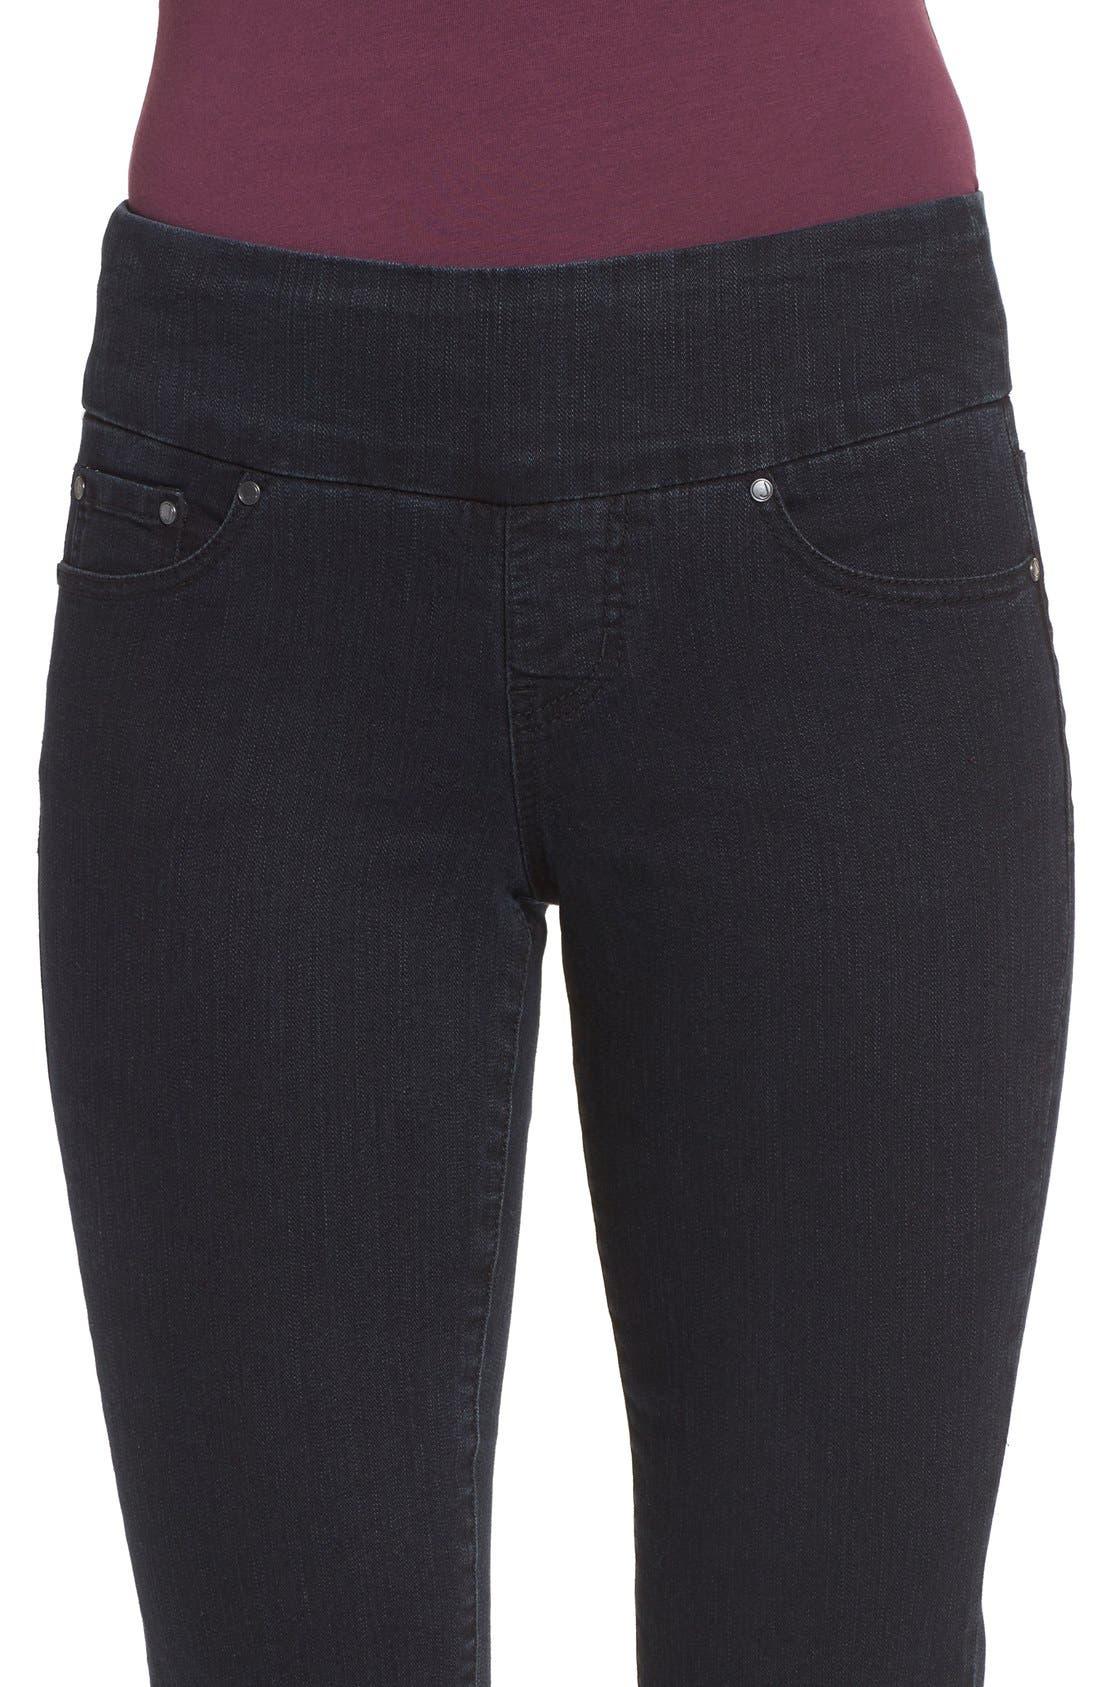 'Peri' Straight Leg Pull-On Jeans,                             Alternate thumbnail 5, color,                             001